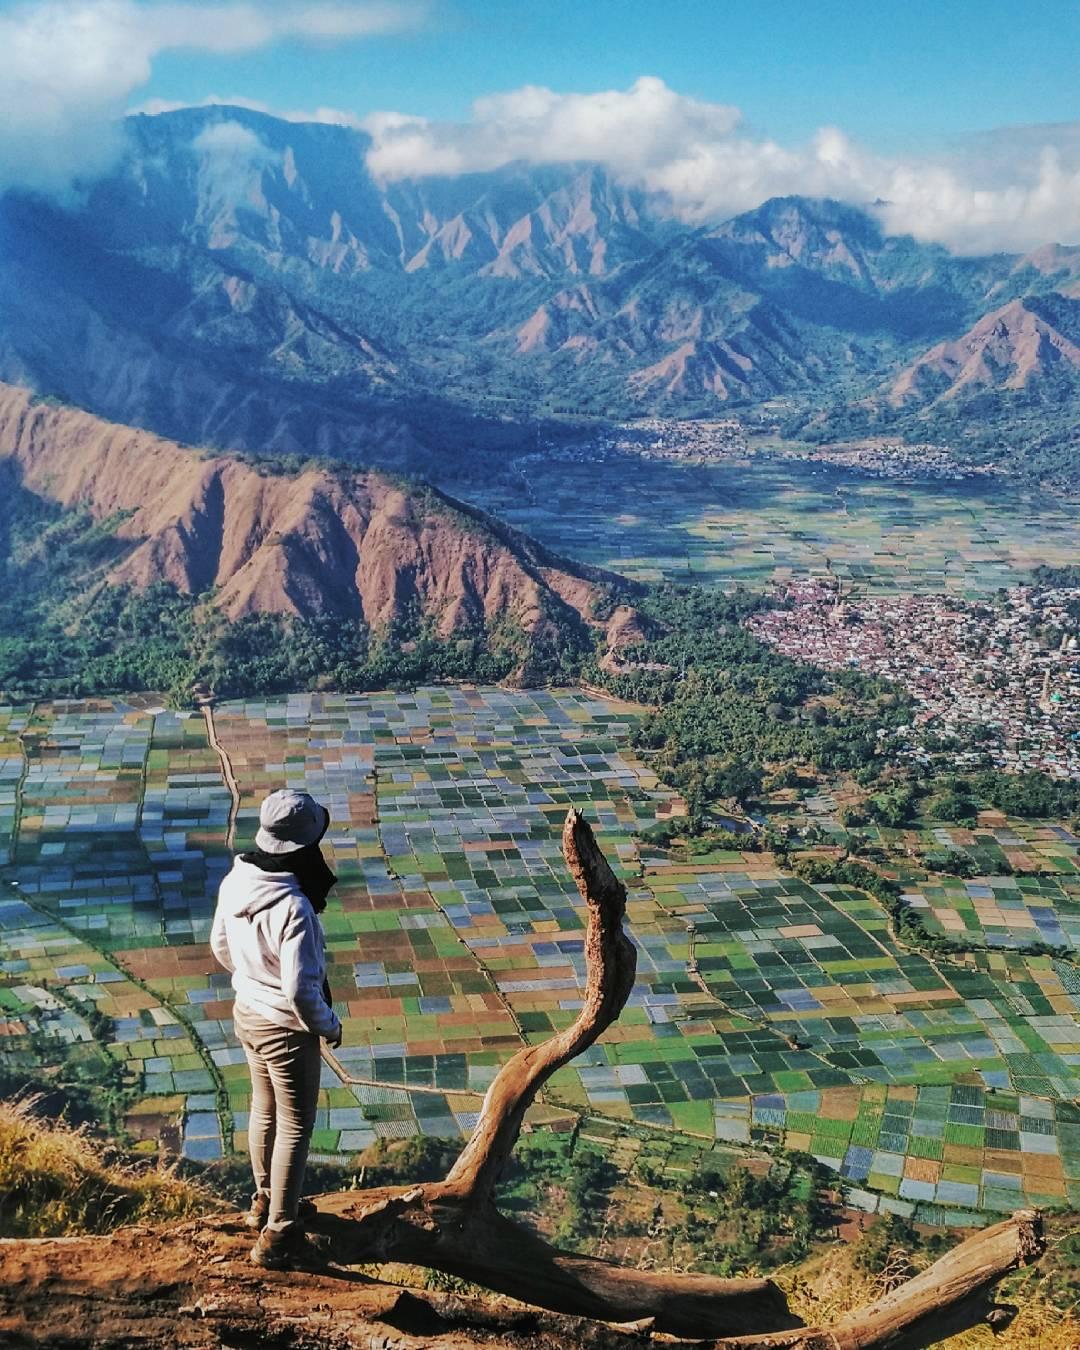 Koleksi Gambar Kartun Pendaki Gunung Kolek Gambar